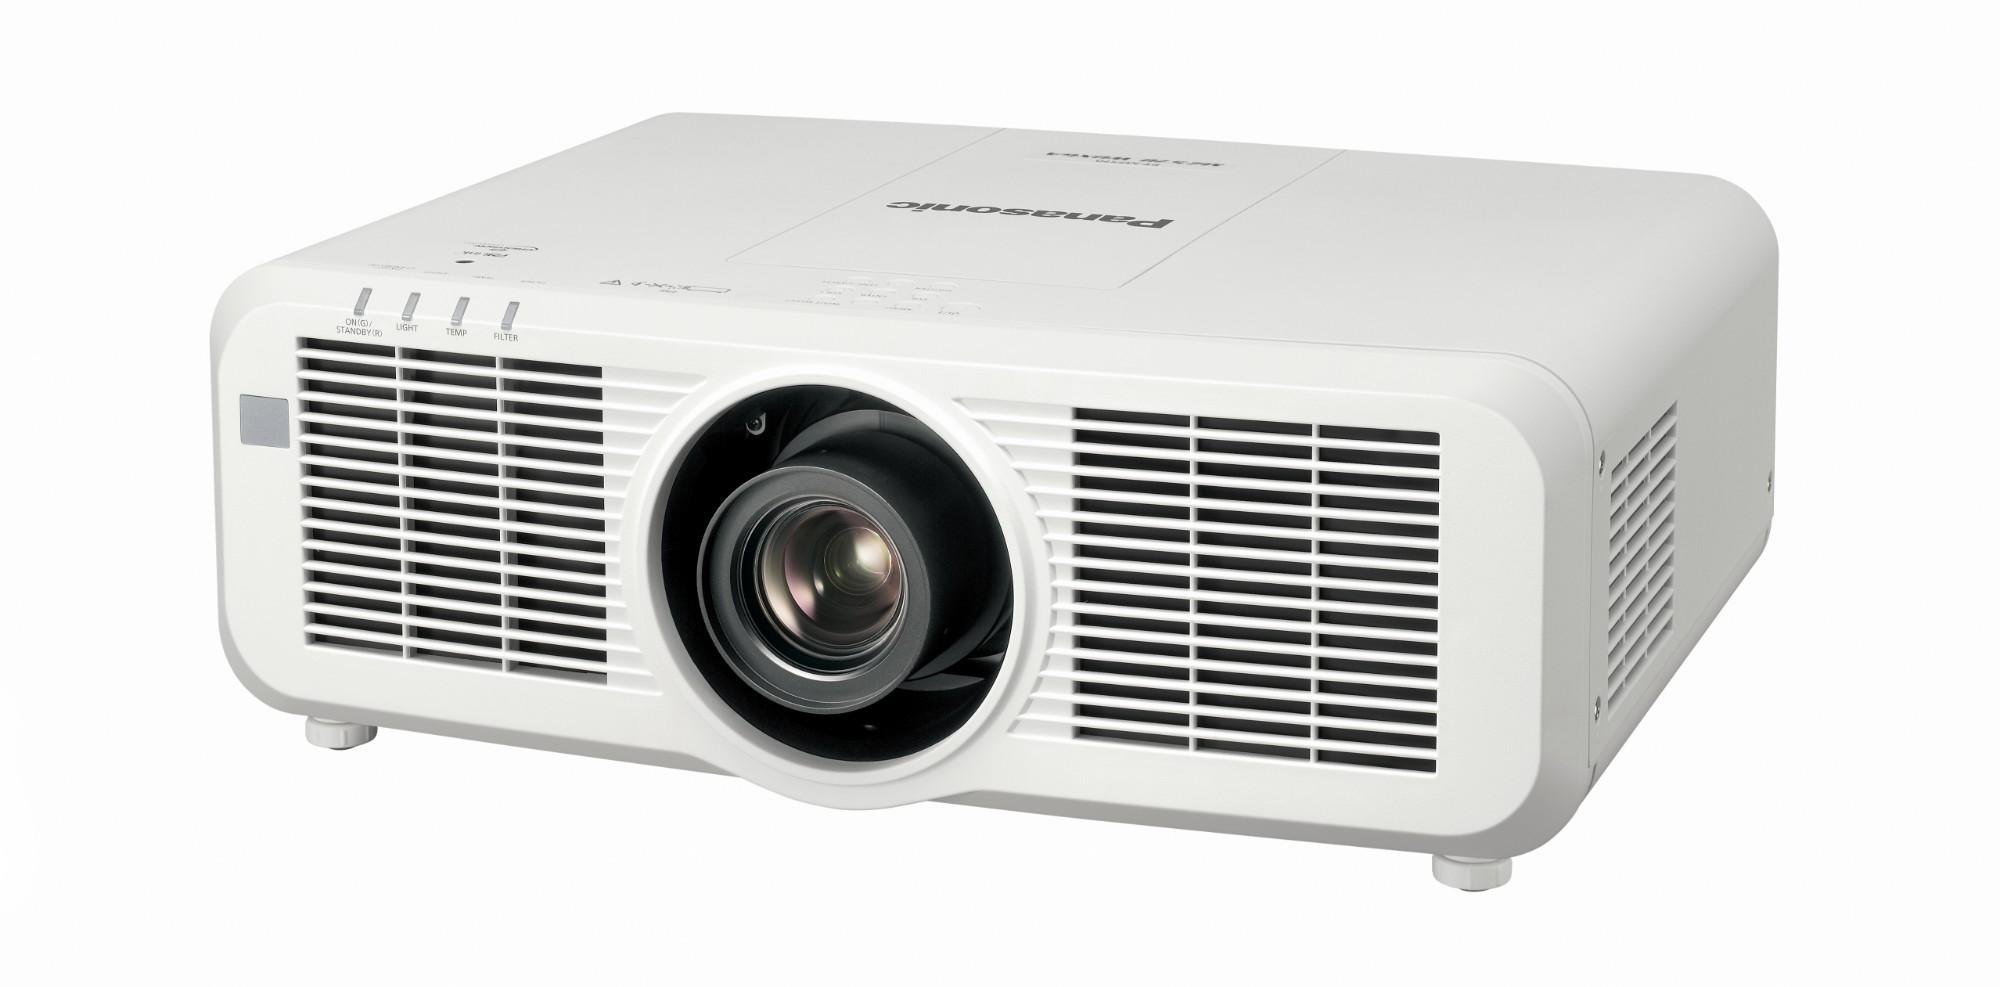 Panasonic PT-MZ570E Desktop projector 5500ANSI lumens 3LCD WUXGA (1920x1200) White data projector